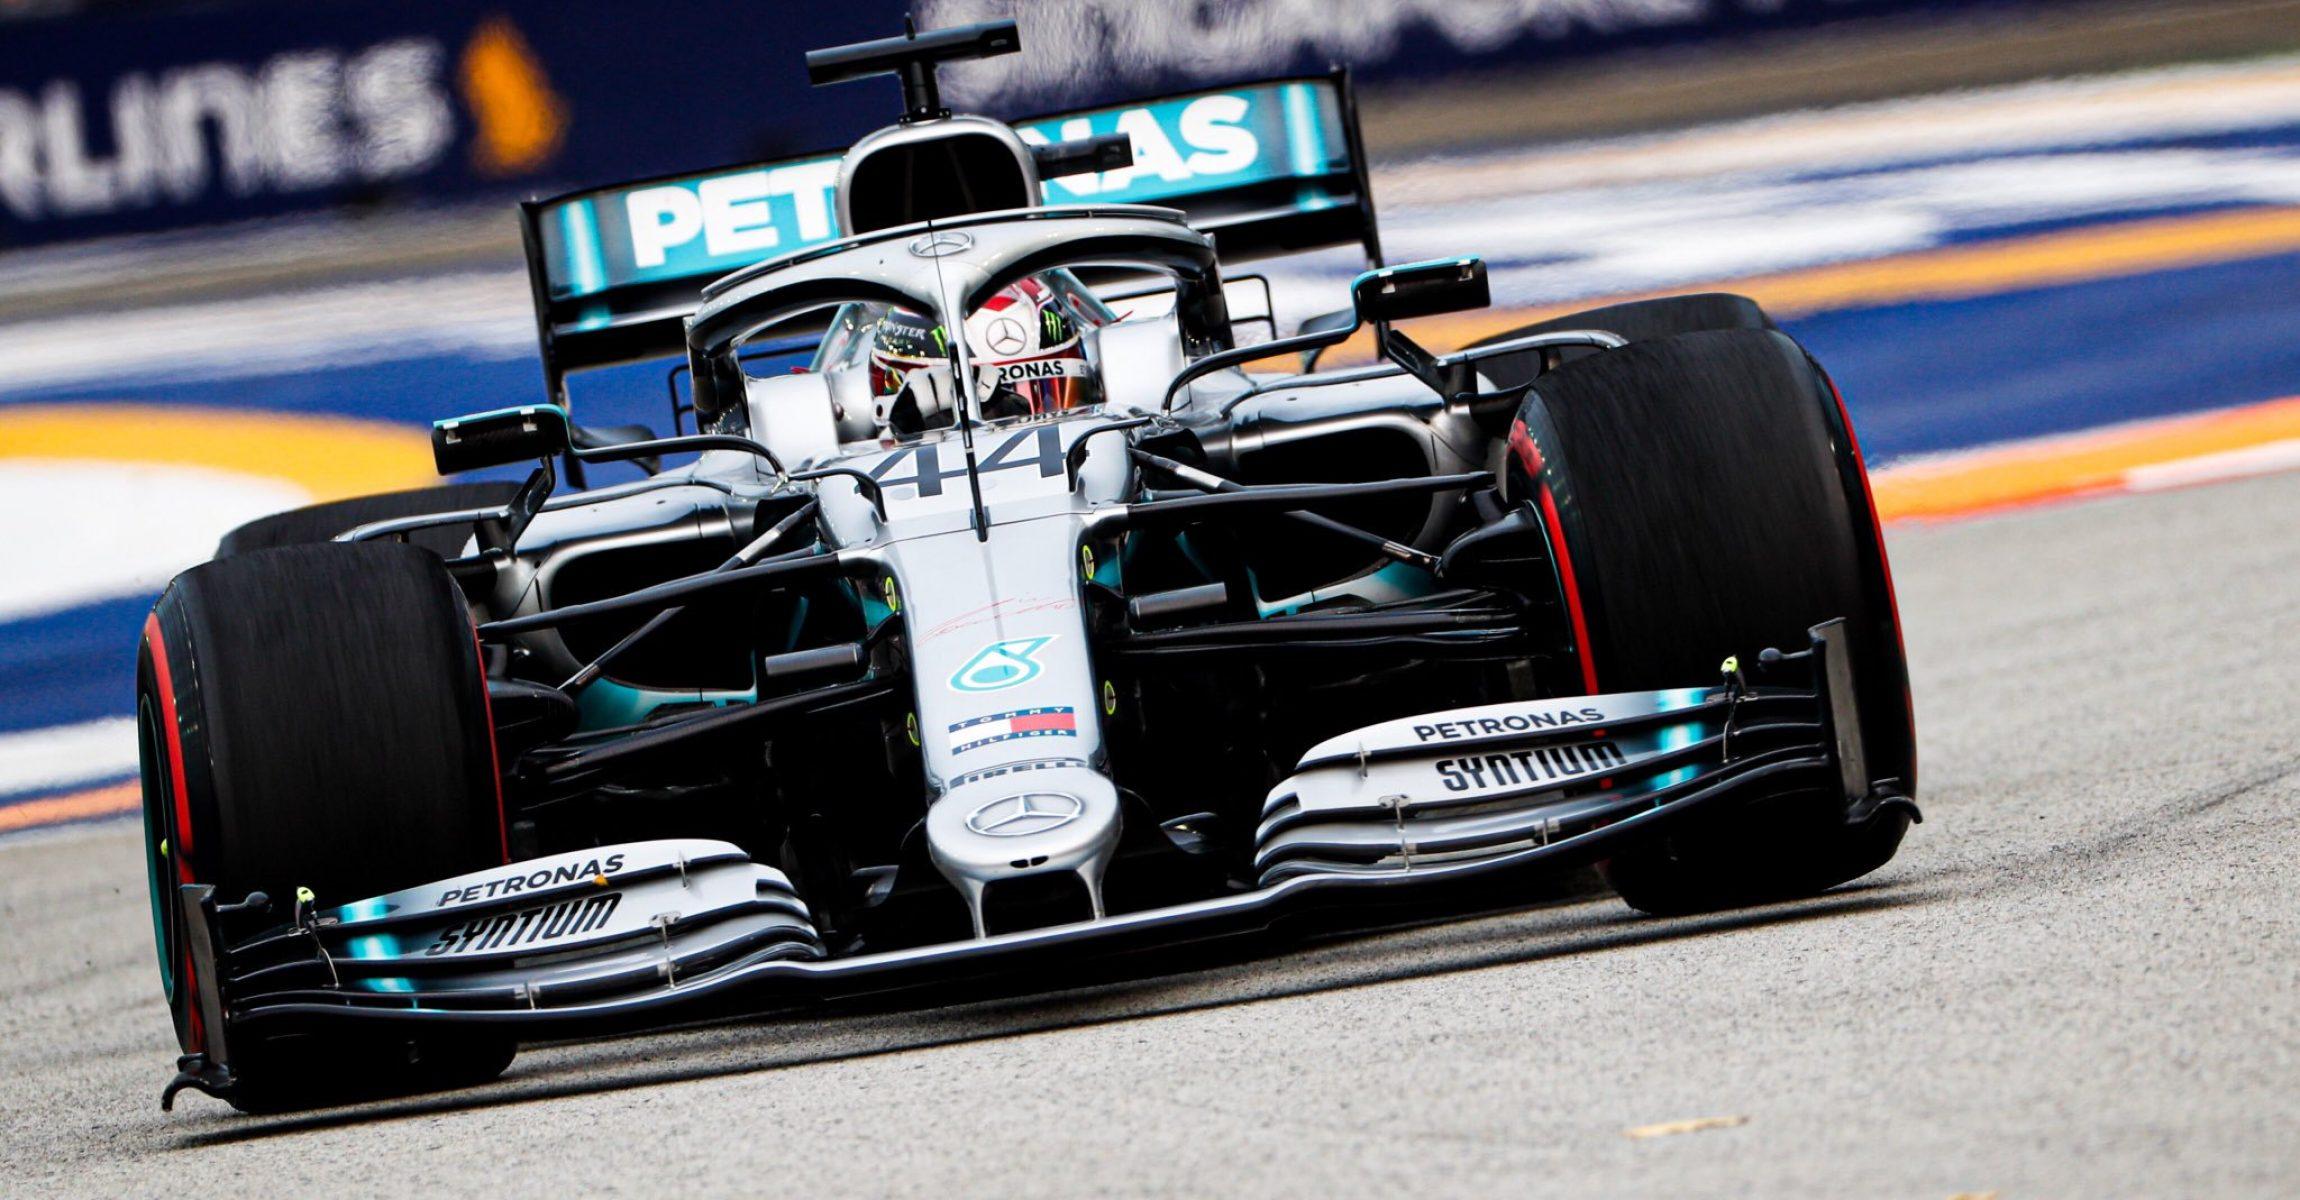 Lewis Hamilton, Mercedes, Singapore 2019, FP1